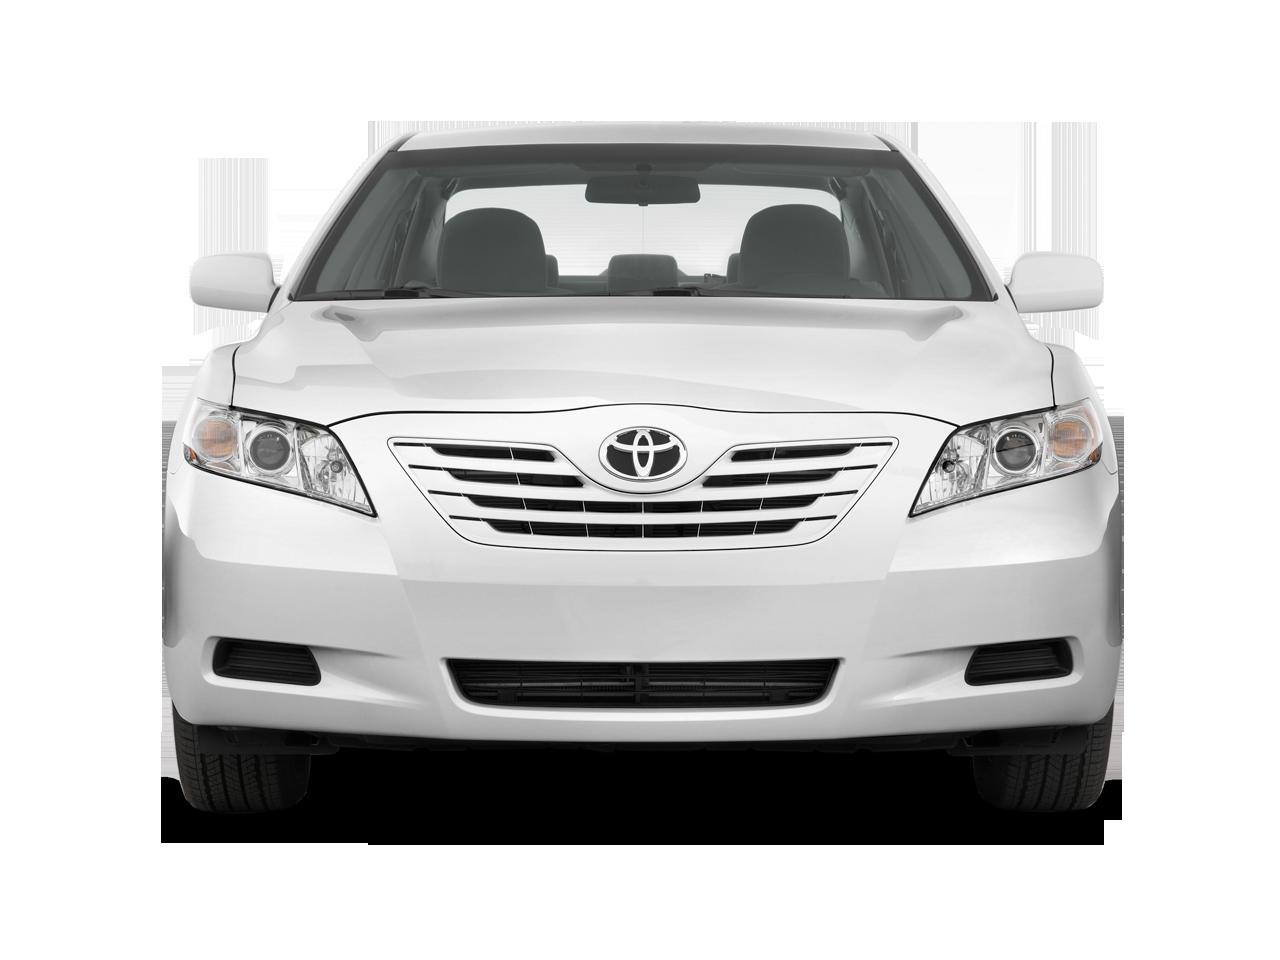 2009 toyota camry xle toyota midsize sedan review automobile magazine. Black Bedroom Furniture Sets. Home Design Ideas